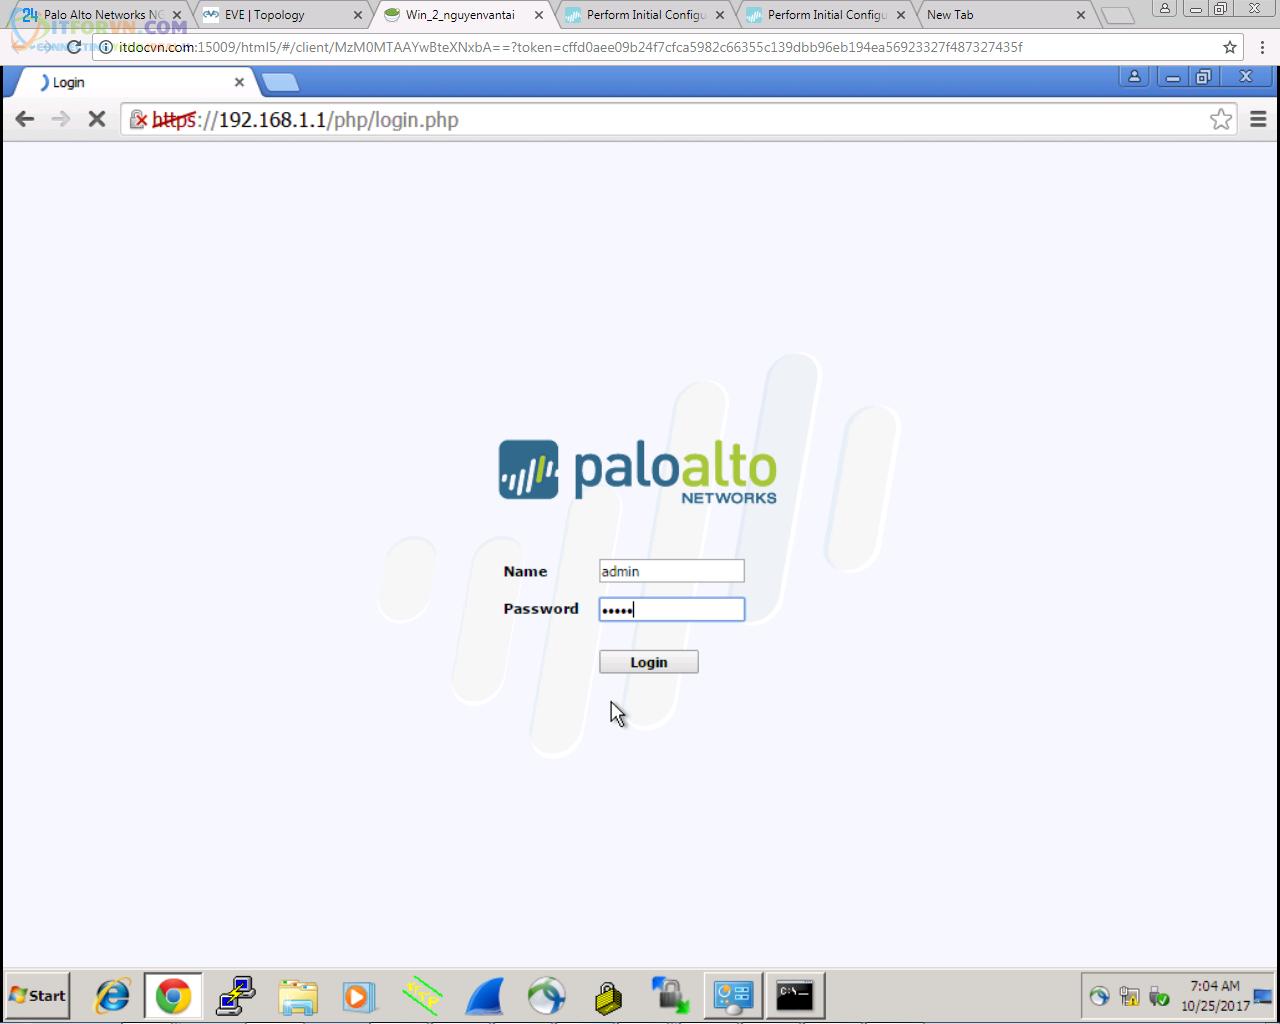 Upload Firmware PaloAlto Eve8 - Up Firmware Palo Alto Trên EVE